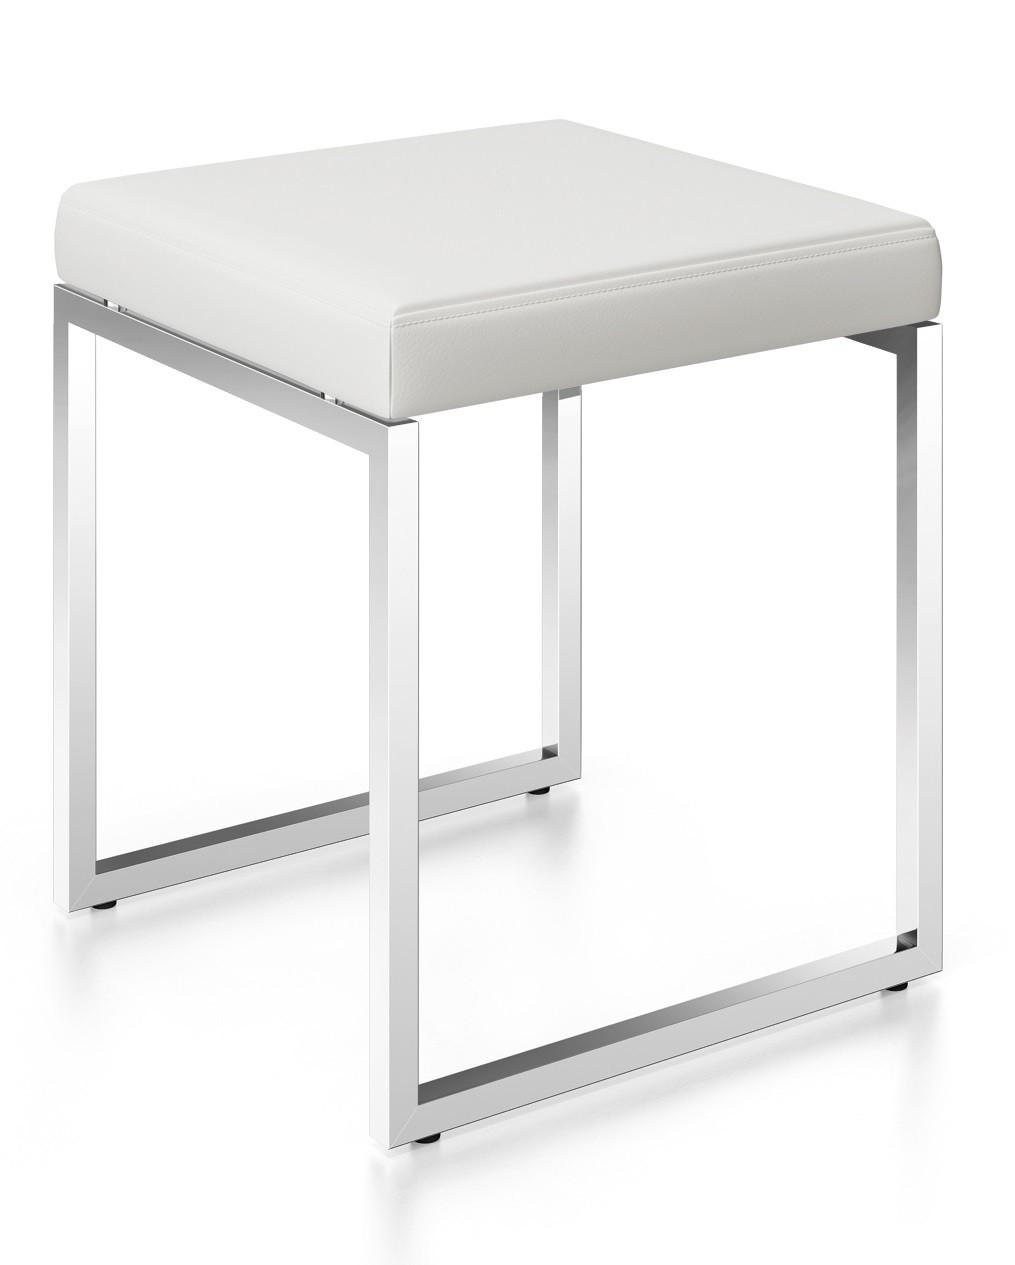 zack edelstahl hocker cenius badhocker stuhl lederhocker. Black Bedroom Furniture Sets. Home Design Ideas